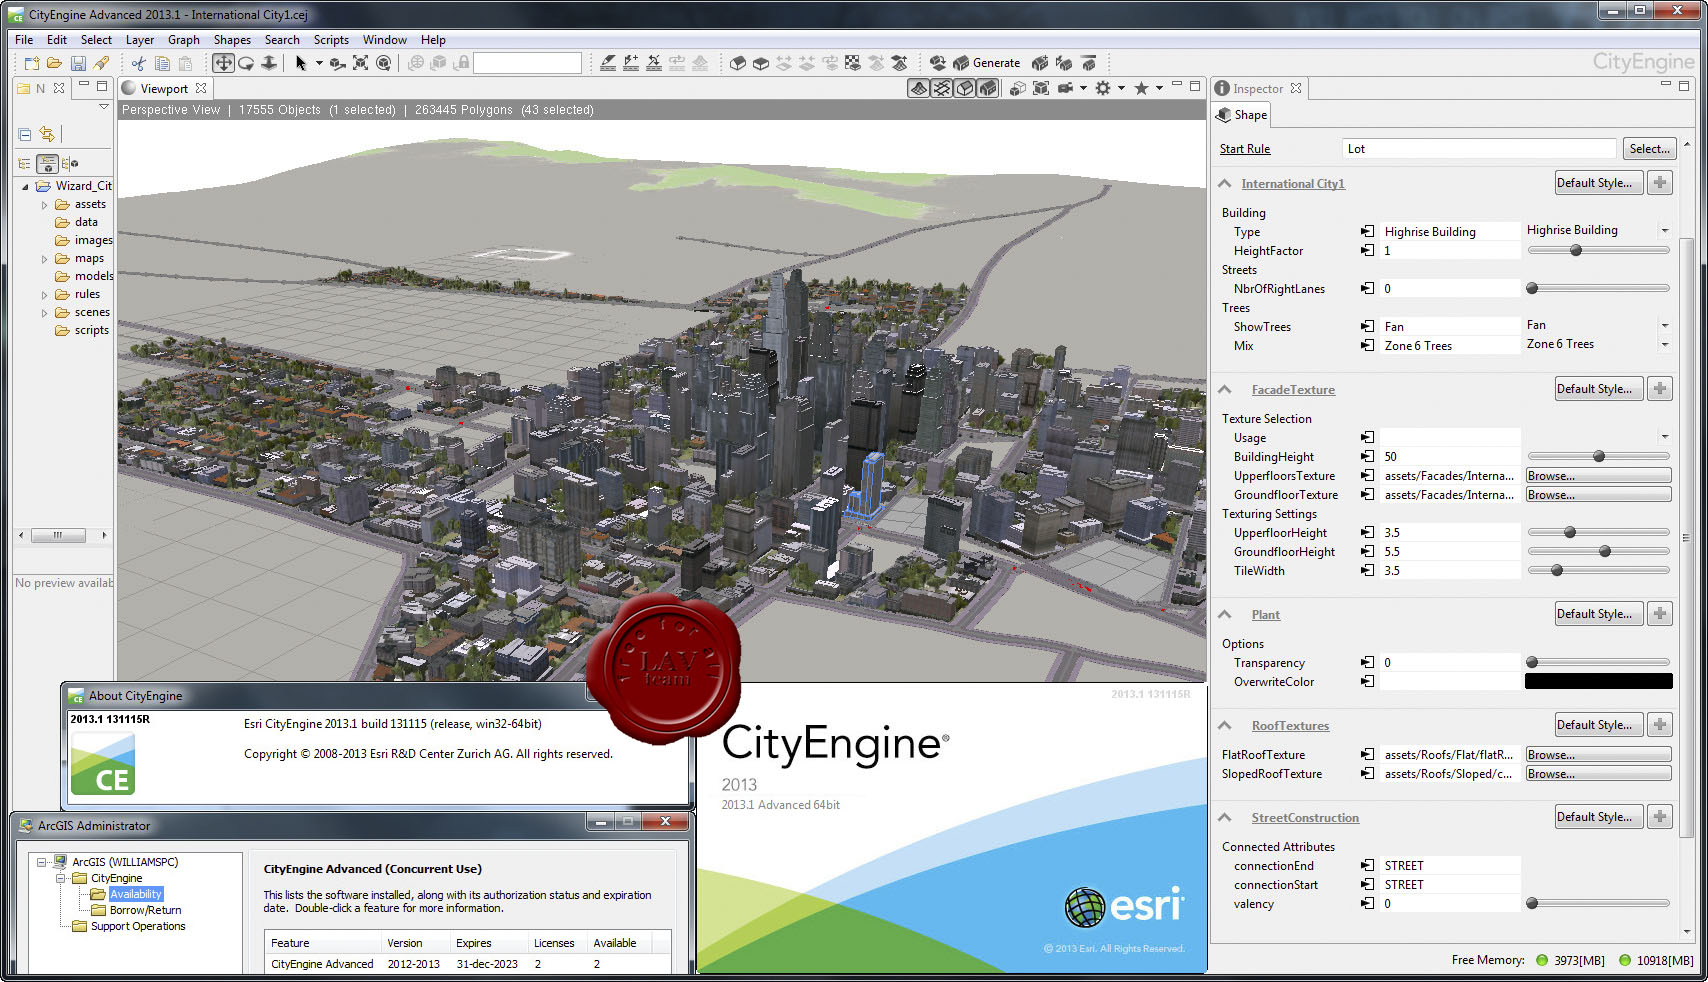 Esri cityengine Advanced 2014